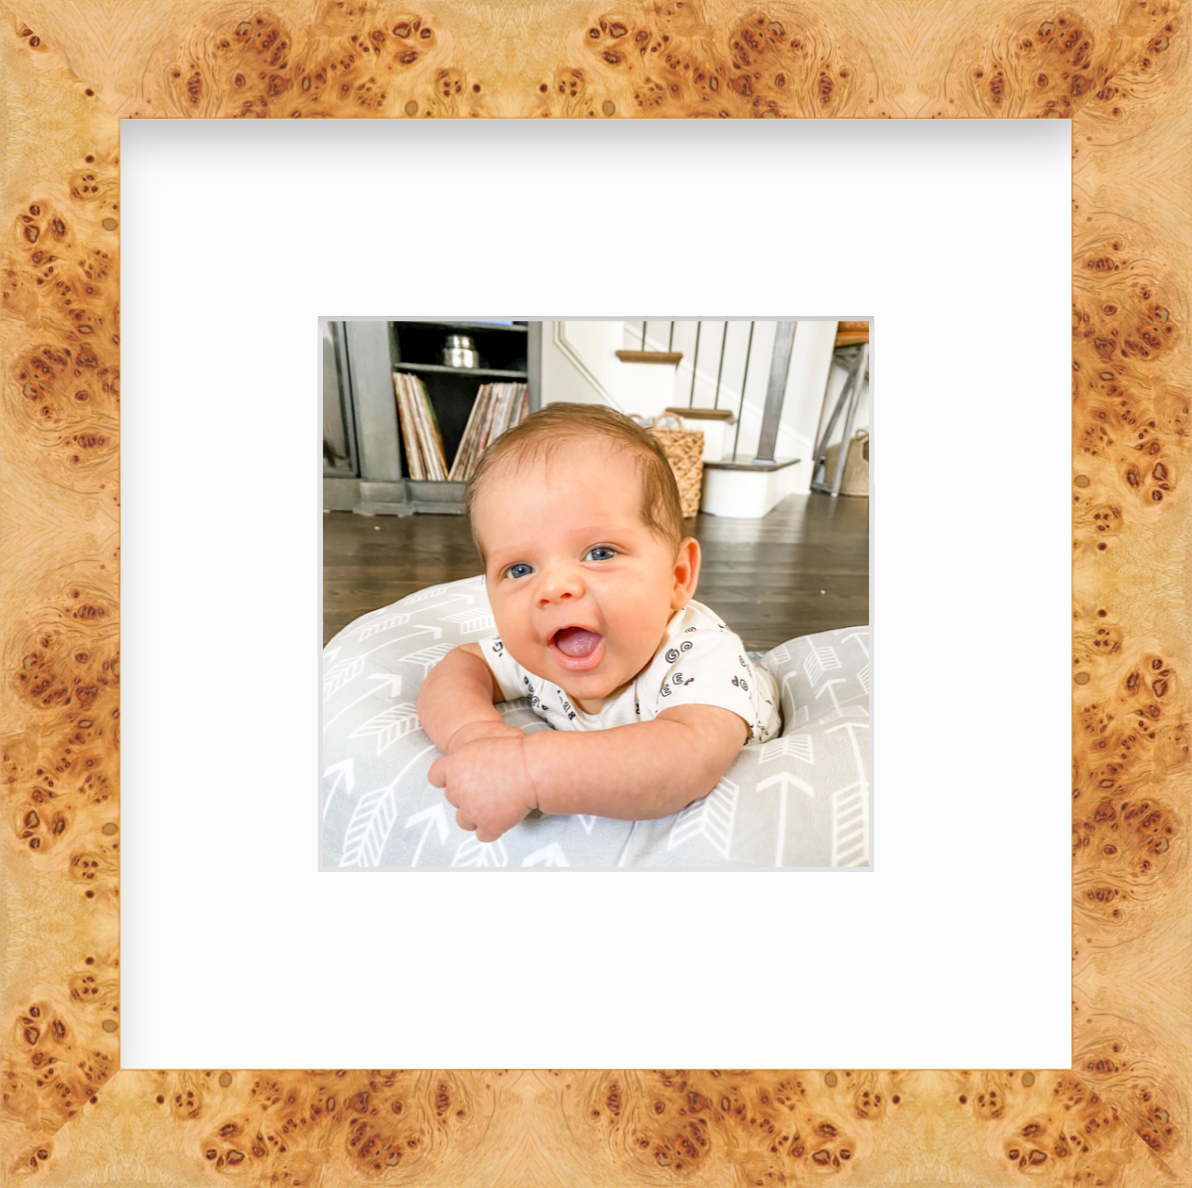 Photo of baby smiling in burlwood frame